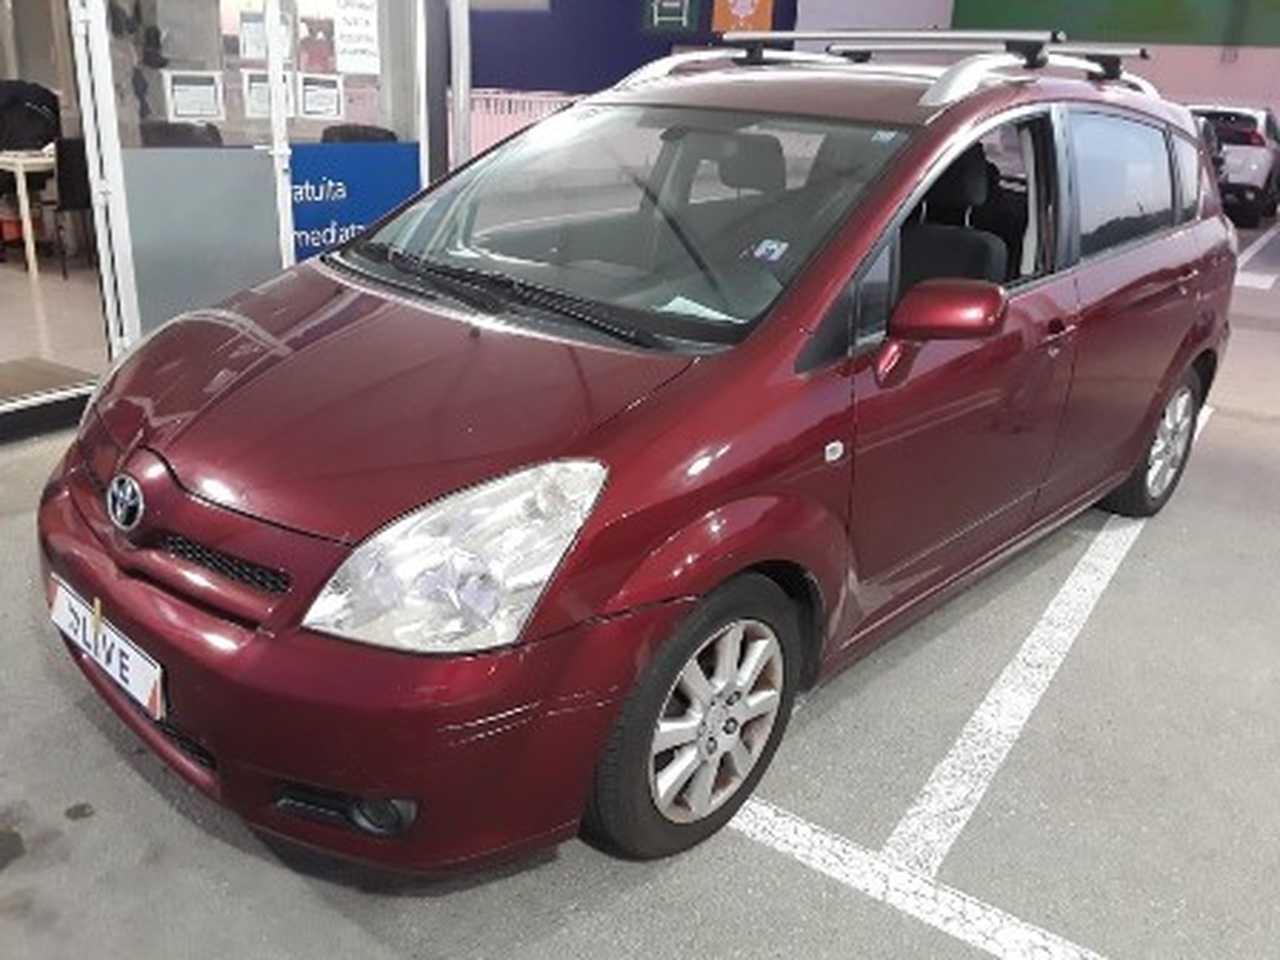 Toyota Corolla Verso 7 plazas   - Foto 1